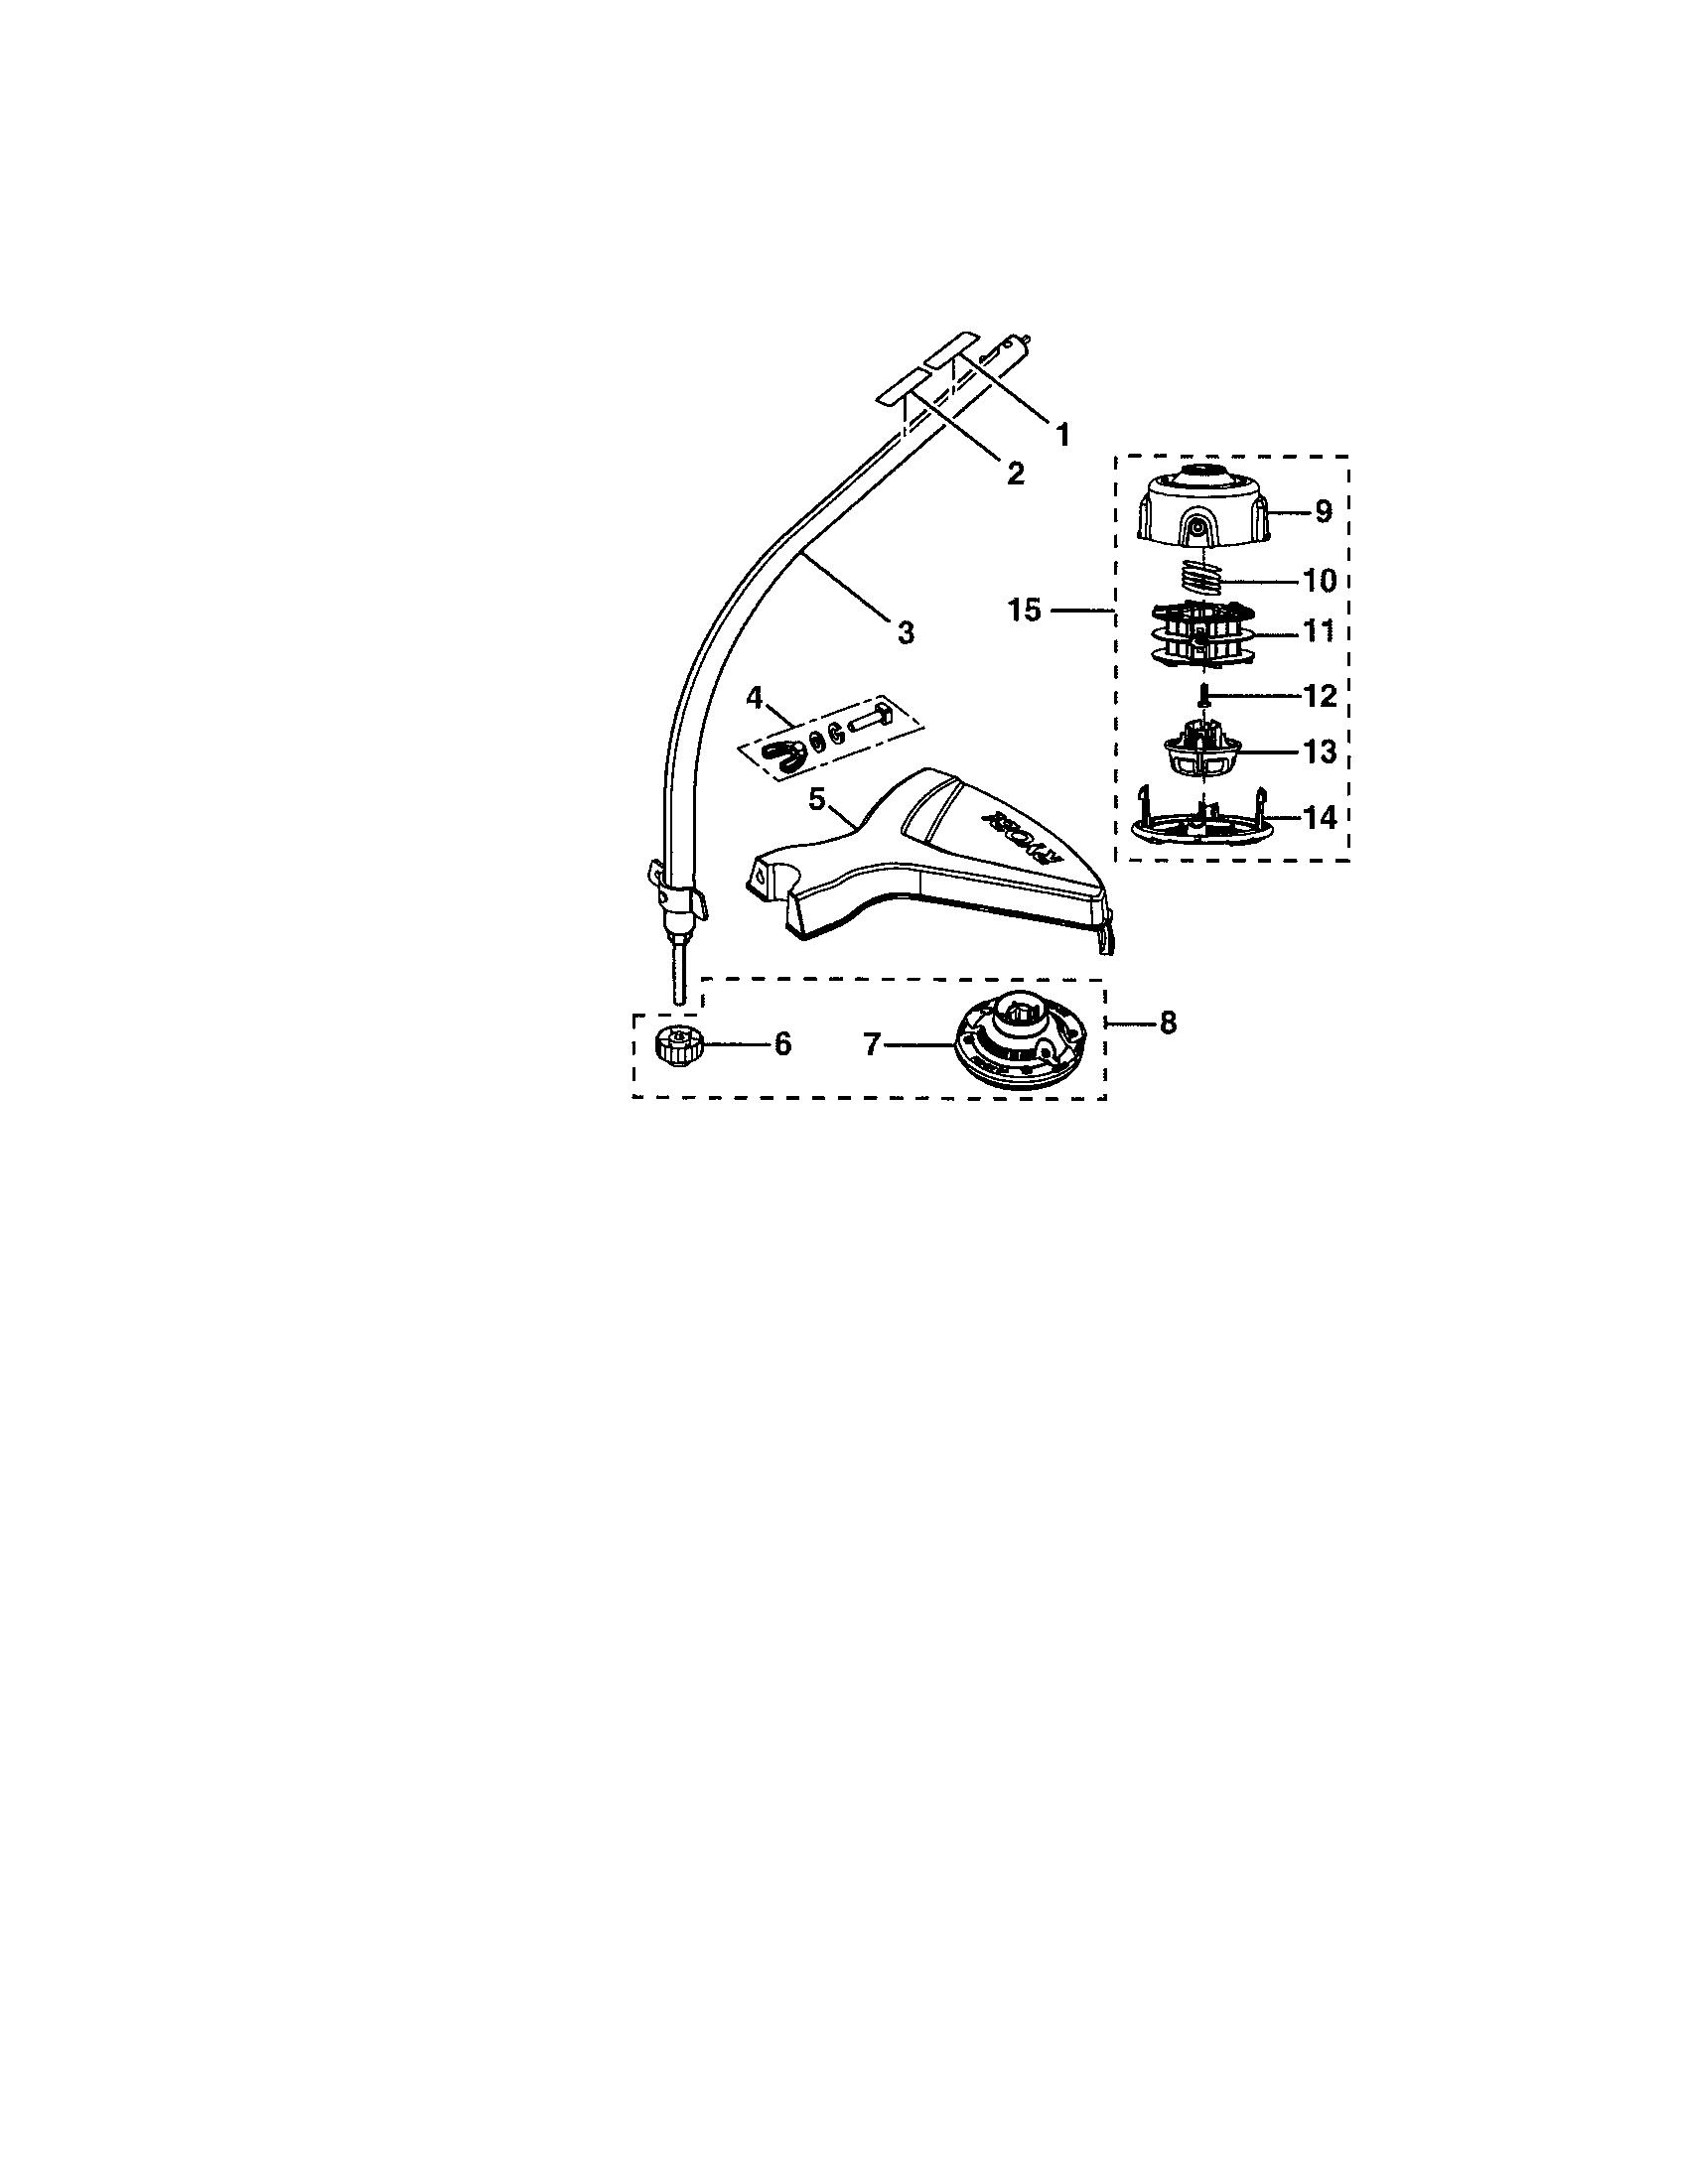 Ryobi model RY30570 line trimmers/weedwackers, gas genuine parts